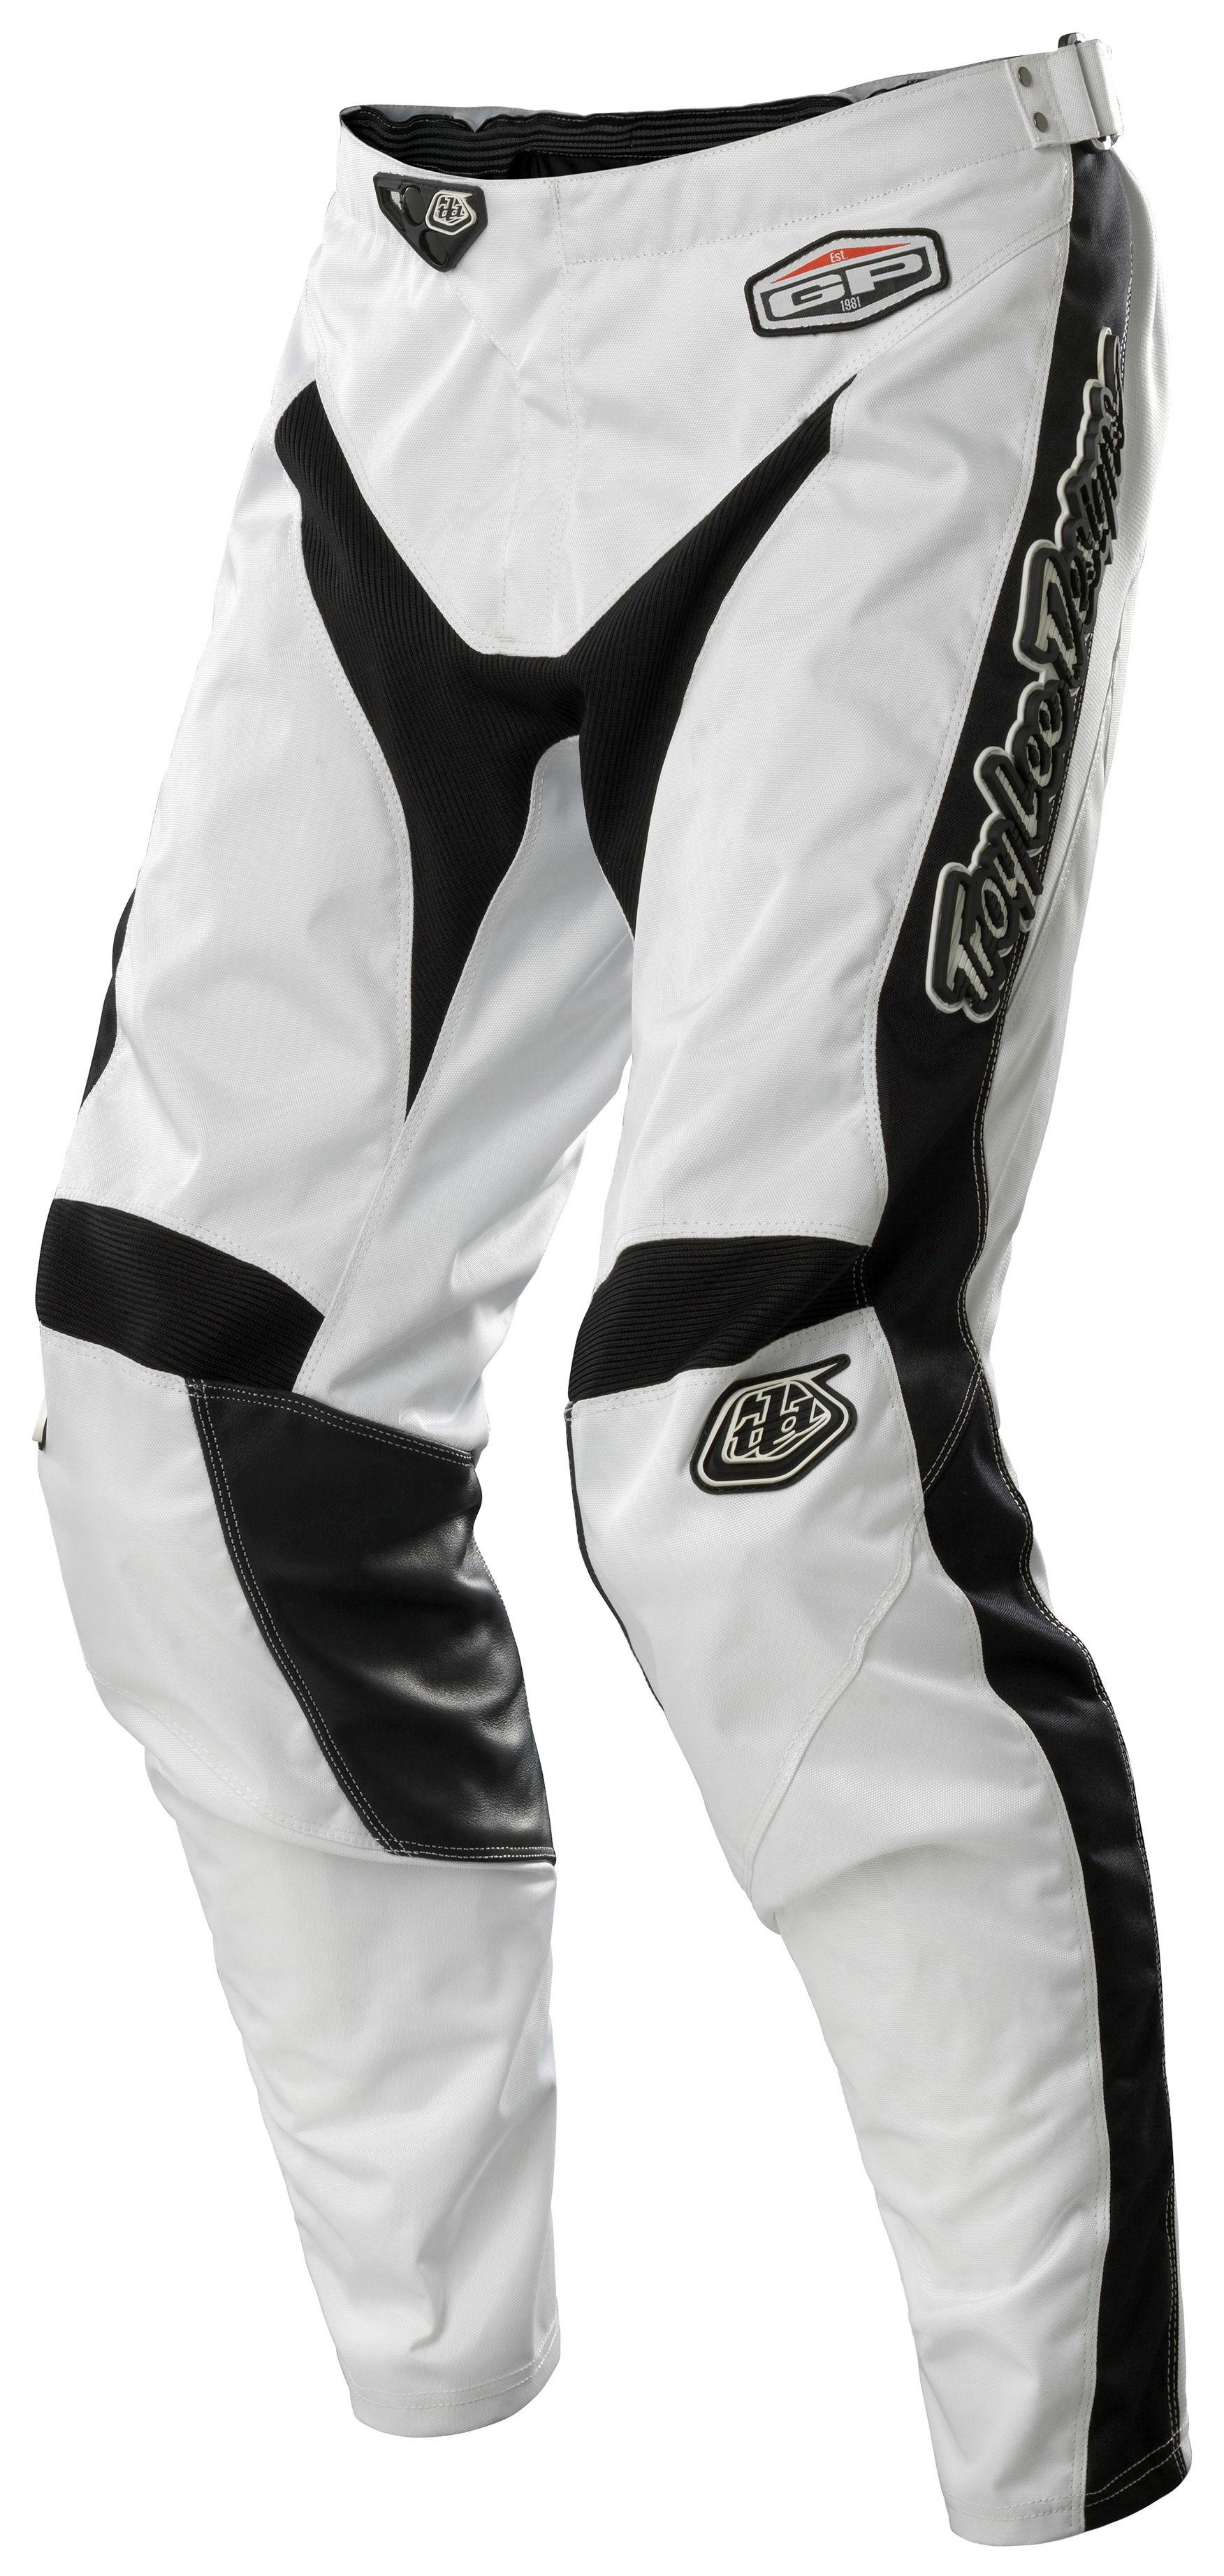 4adc63d7 Troy Lee GP White-Out Pants - RevZilla